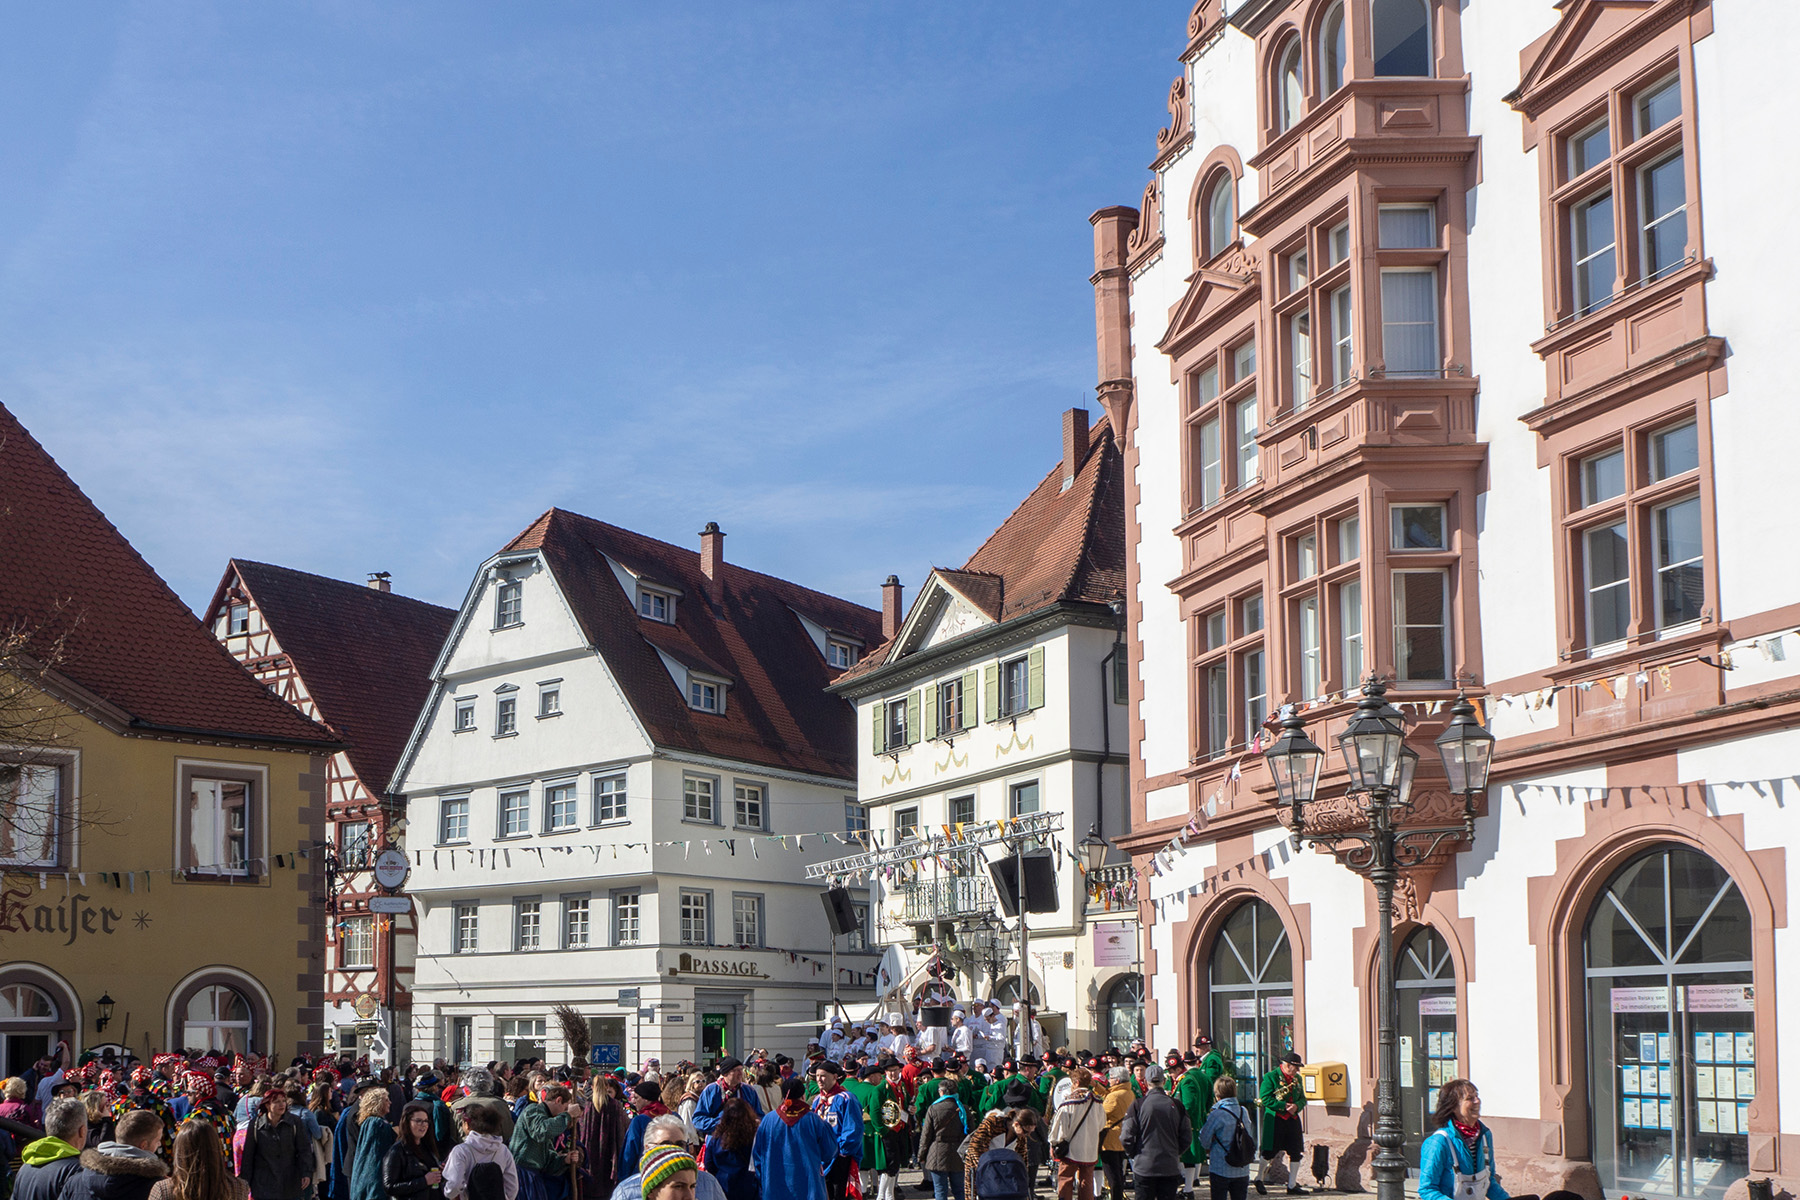 The city center of Pfullendorf